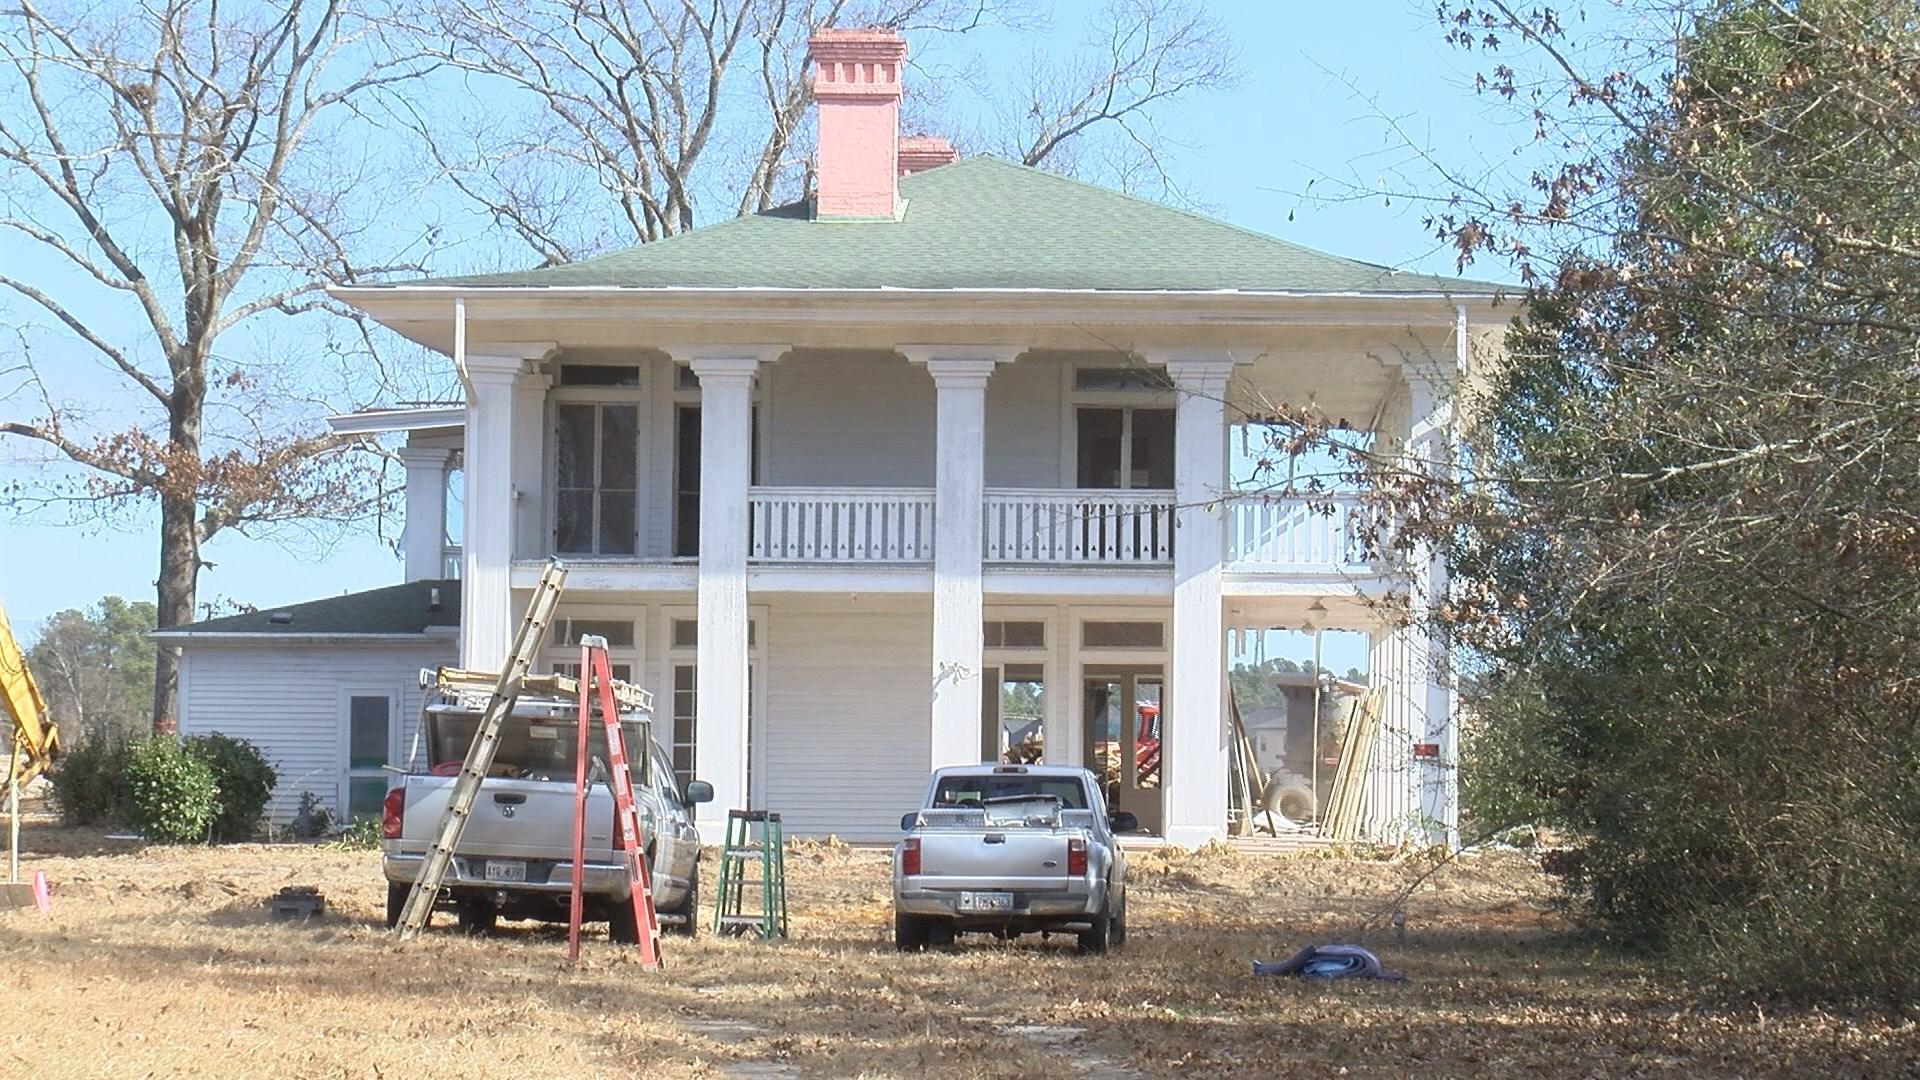 100 Year Old Dodge House Of Grovetown Torn Down Arizona